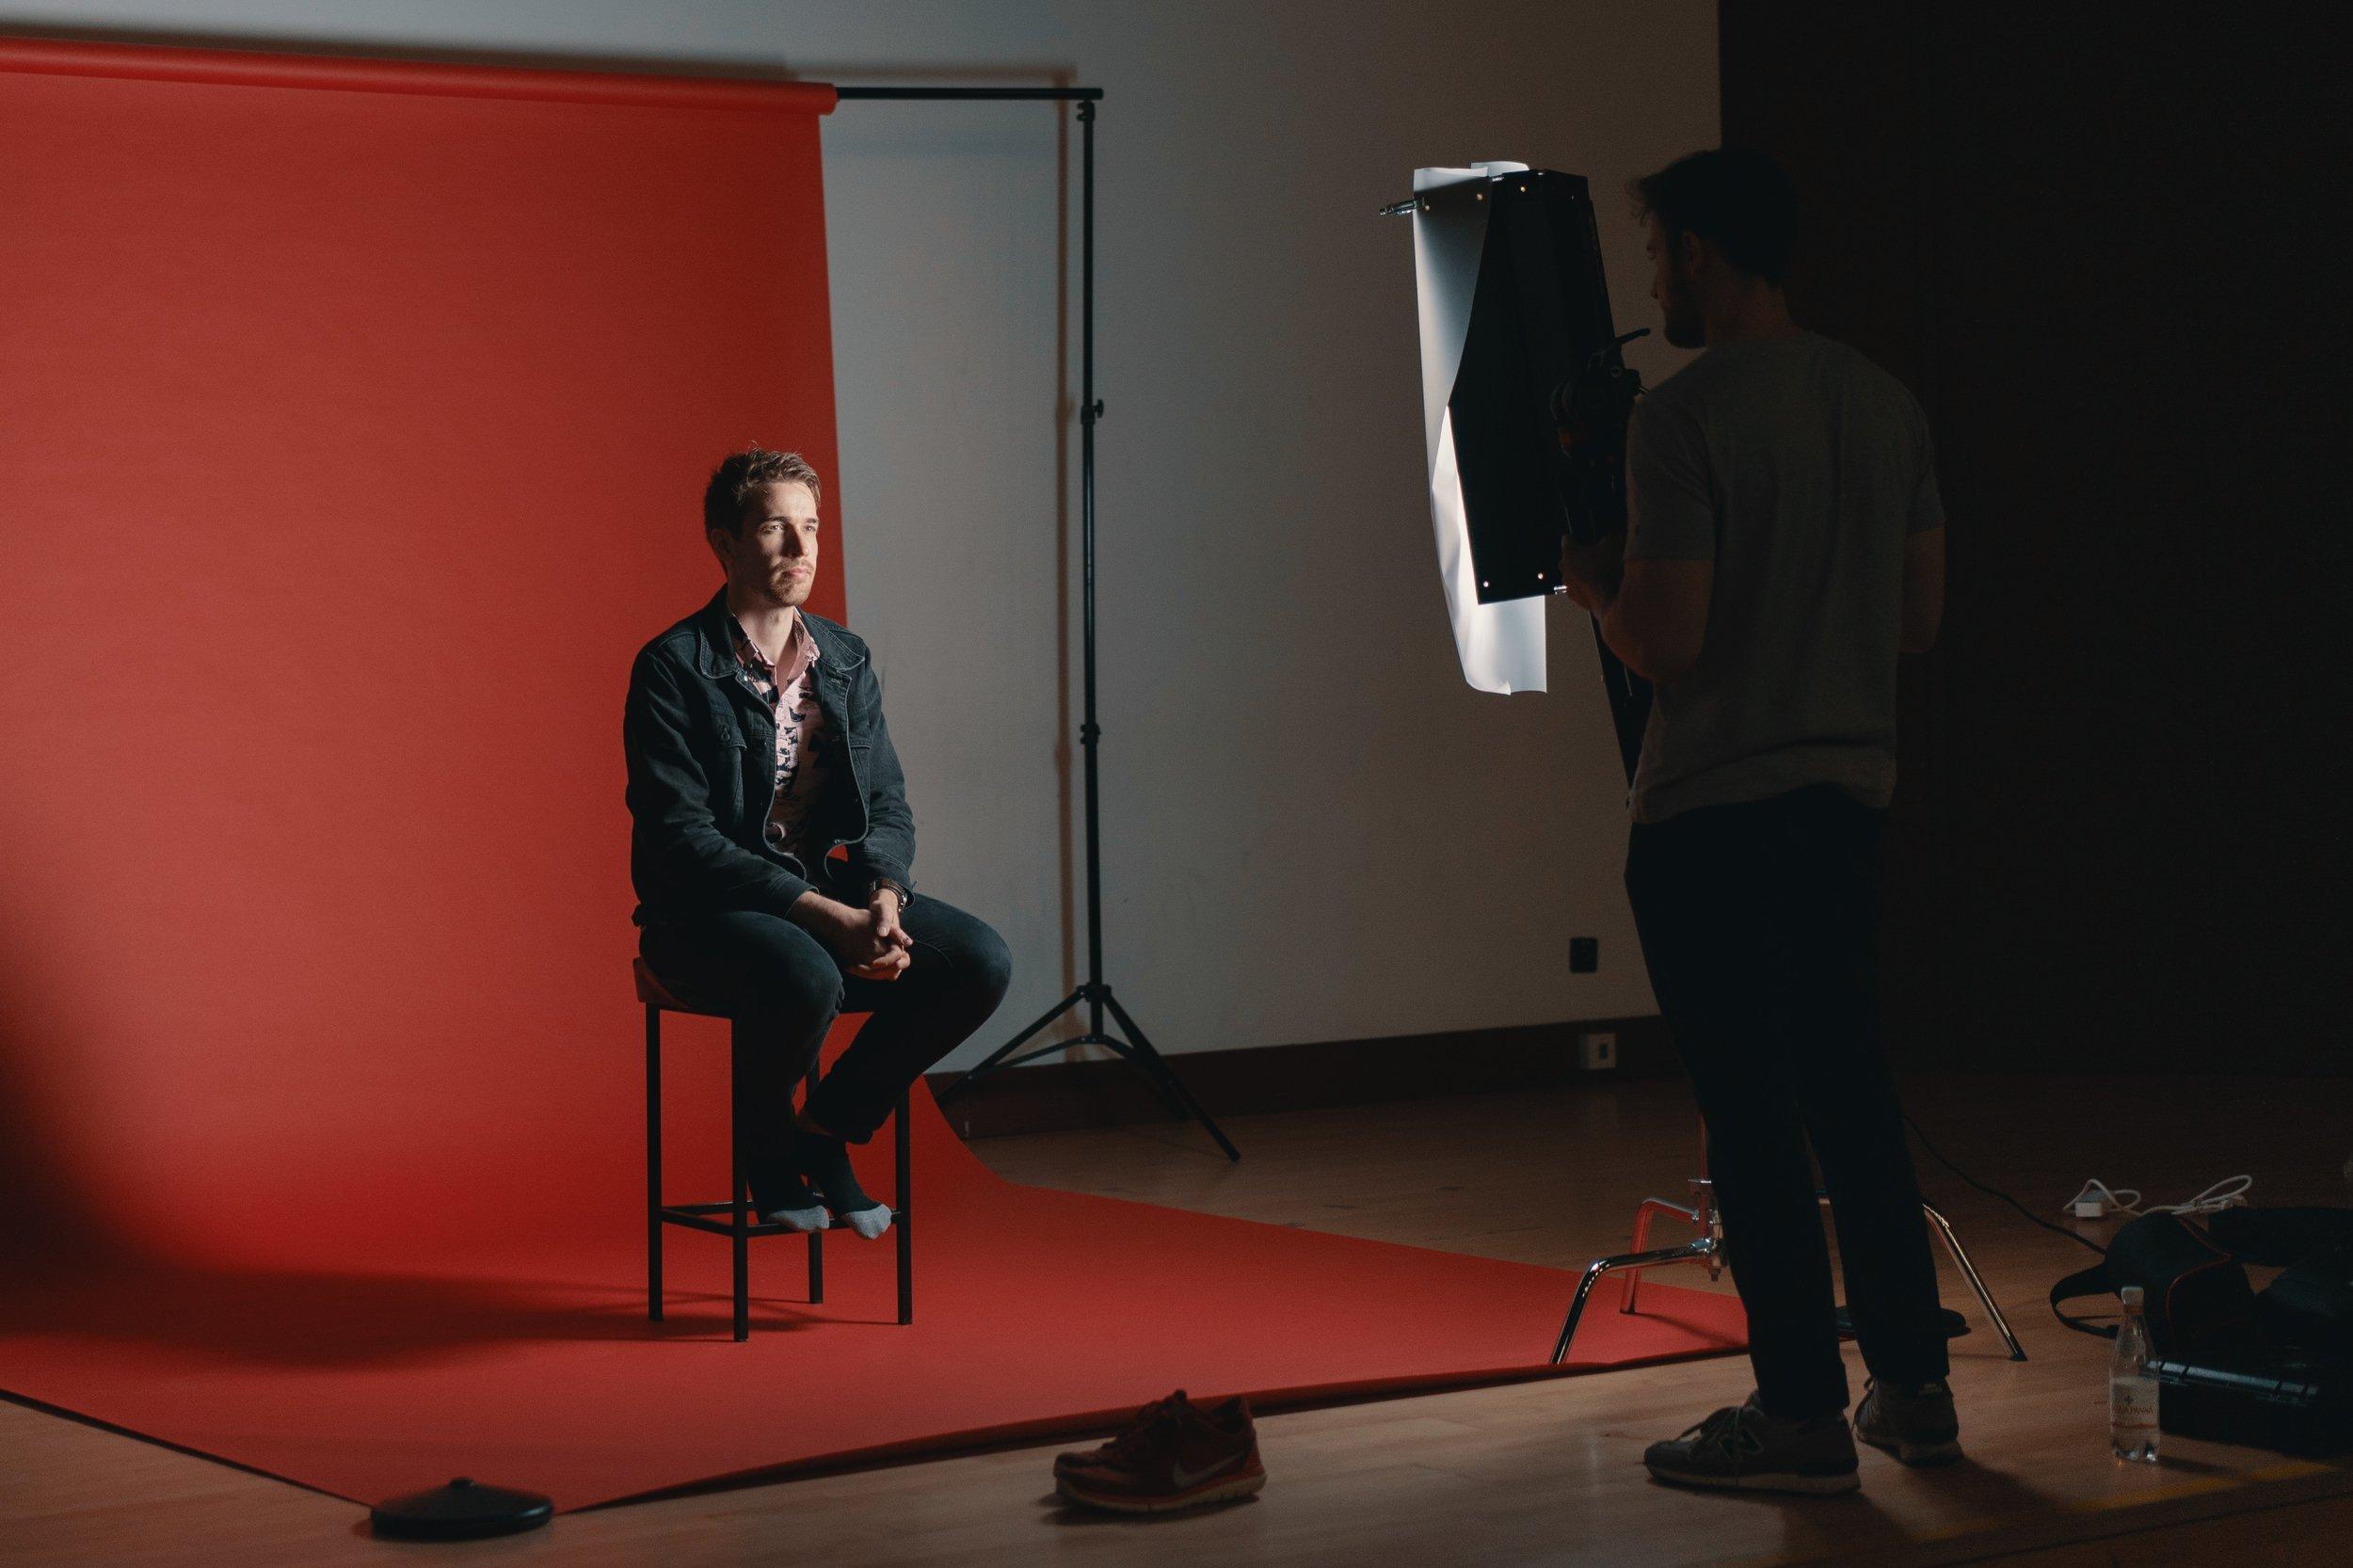 Photo By: Ross Sneddon   Corporate Video Production in Progress